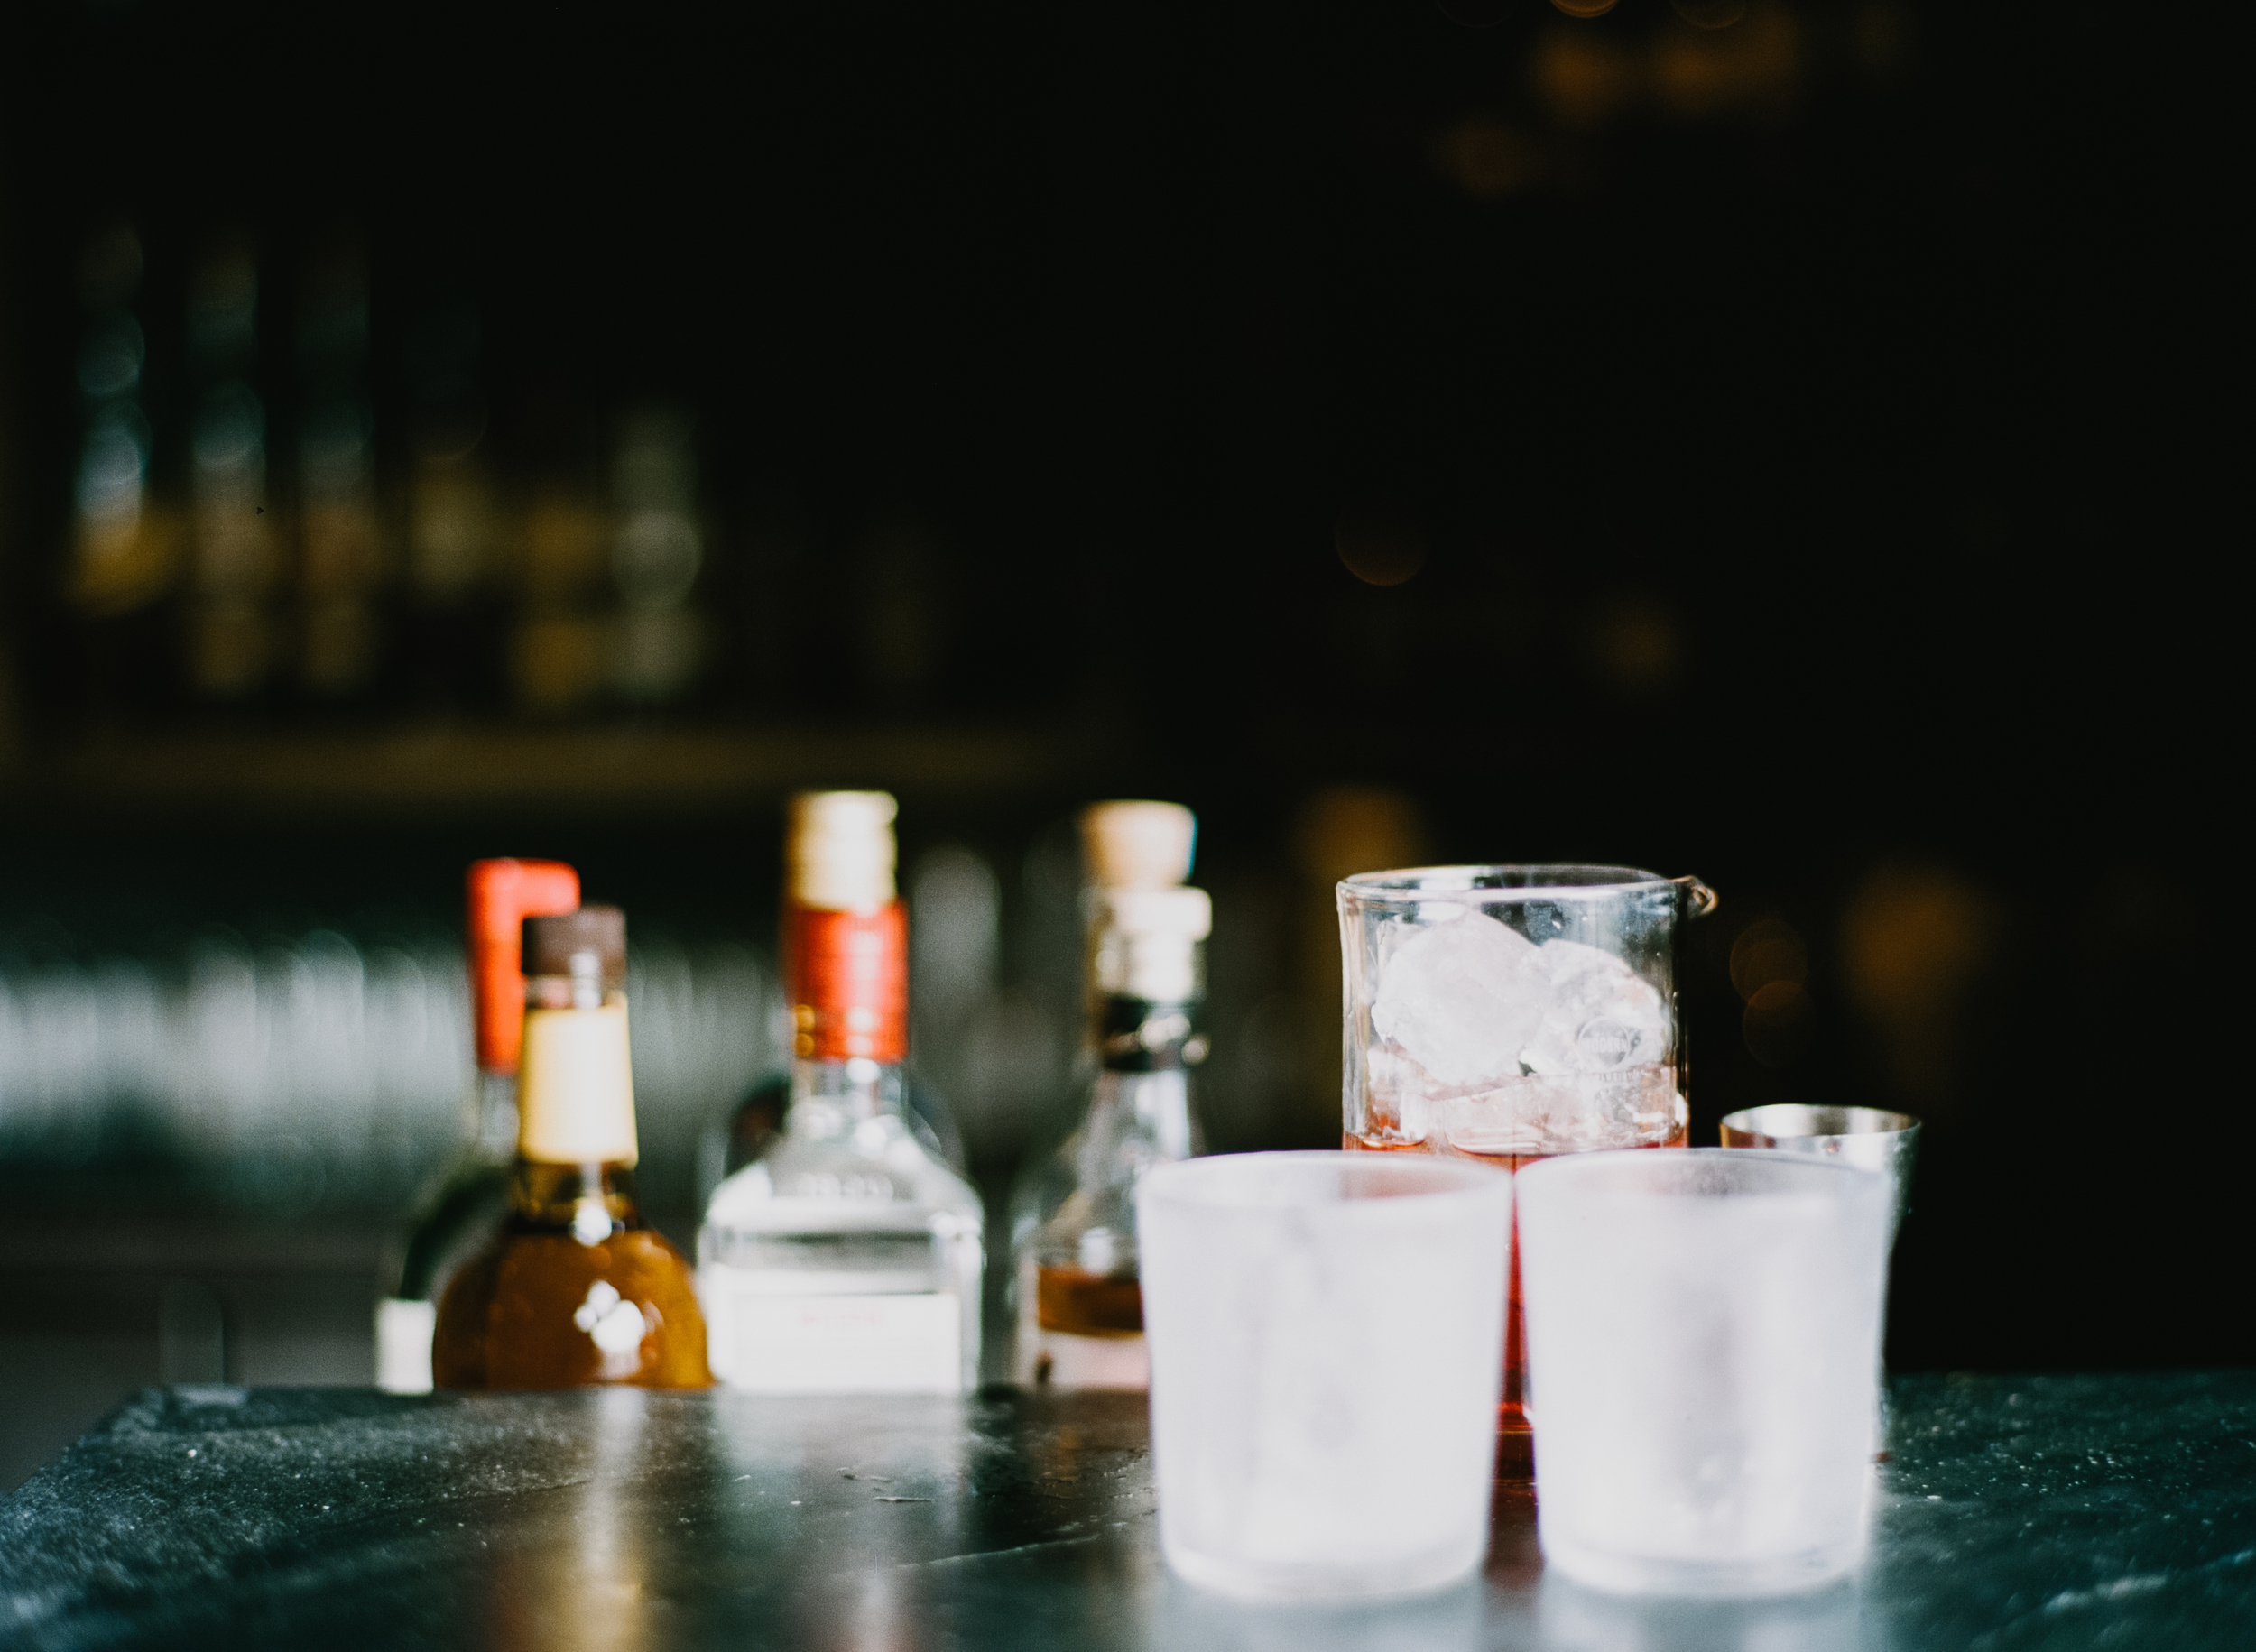 TrickDog_Bar_San_Francisco_City_Guide_Drinks_Cocktails_Lifestyle_Zack_Arp-754.jpg